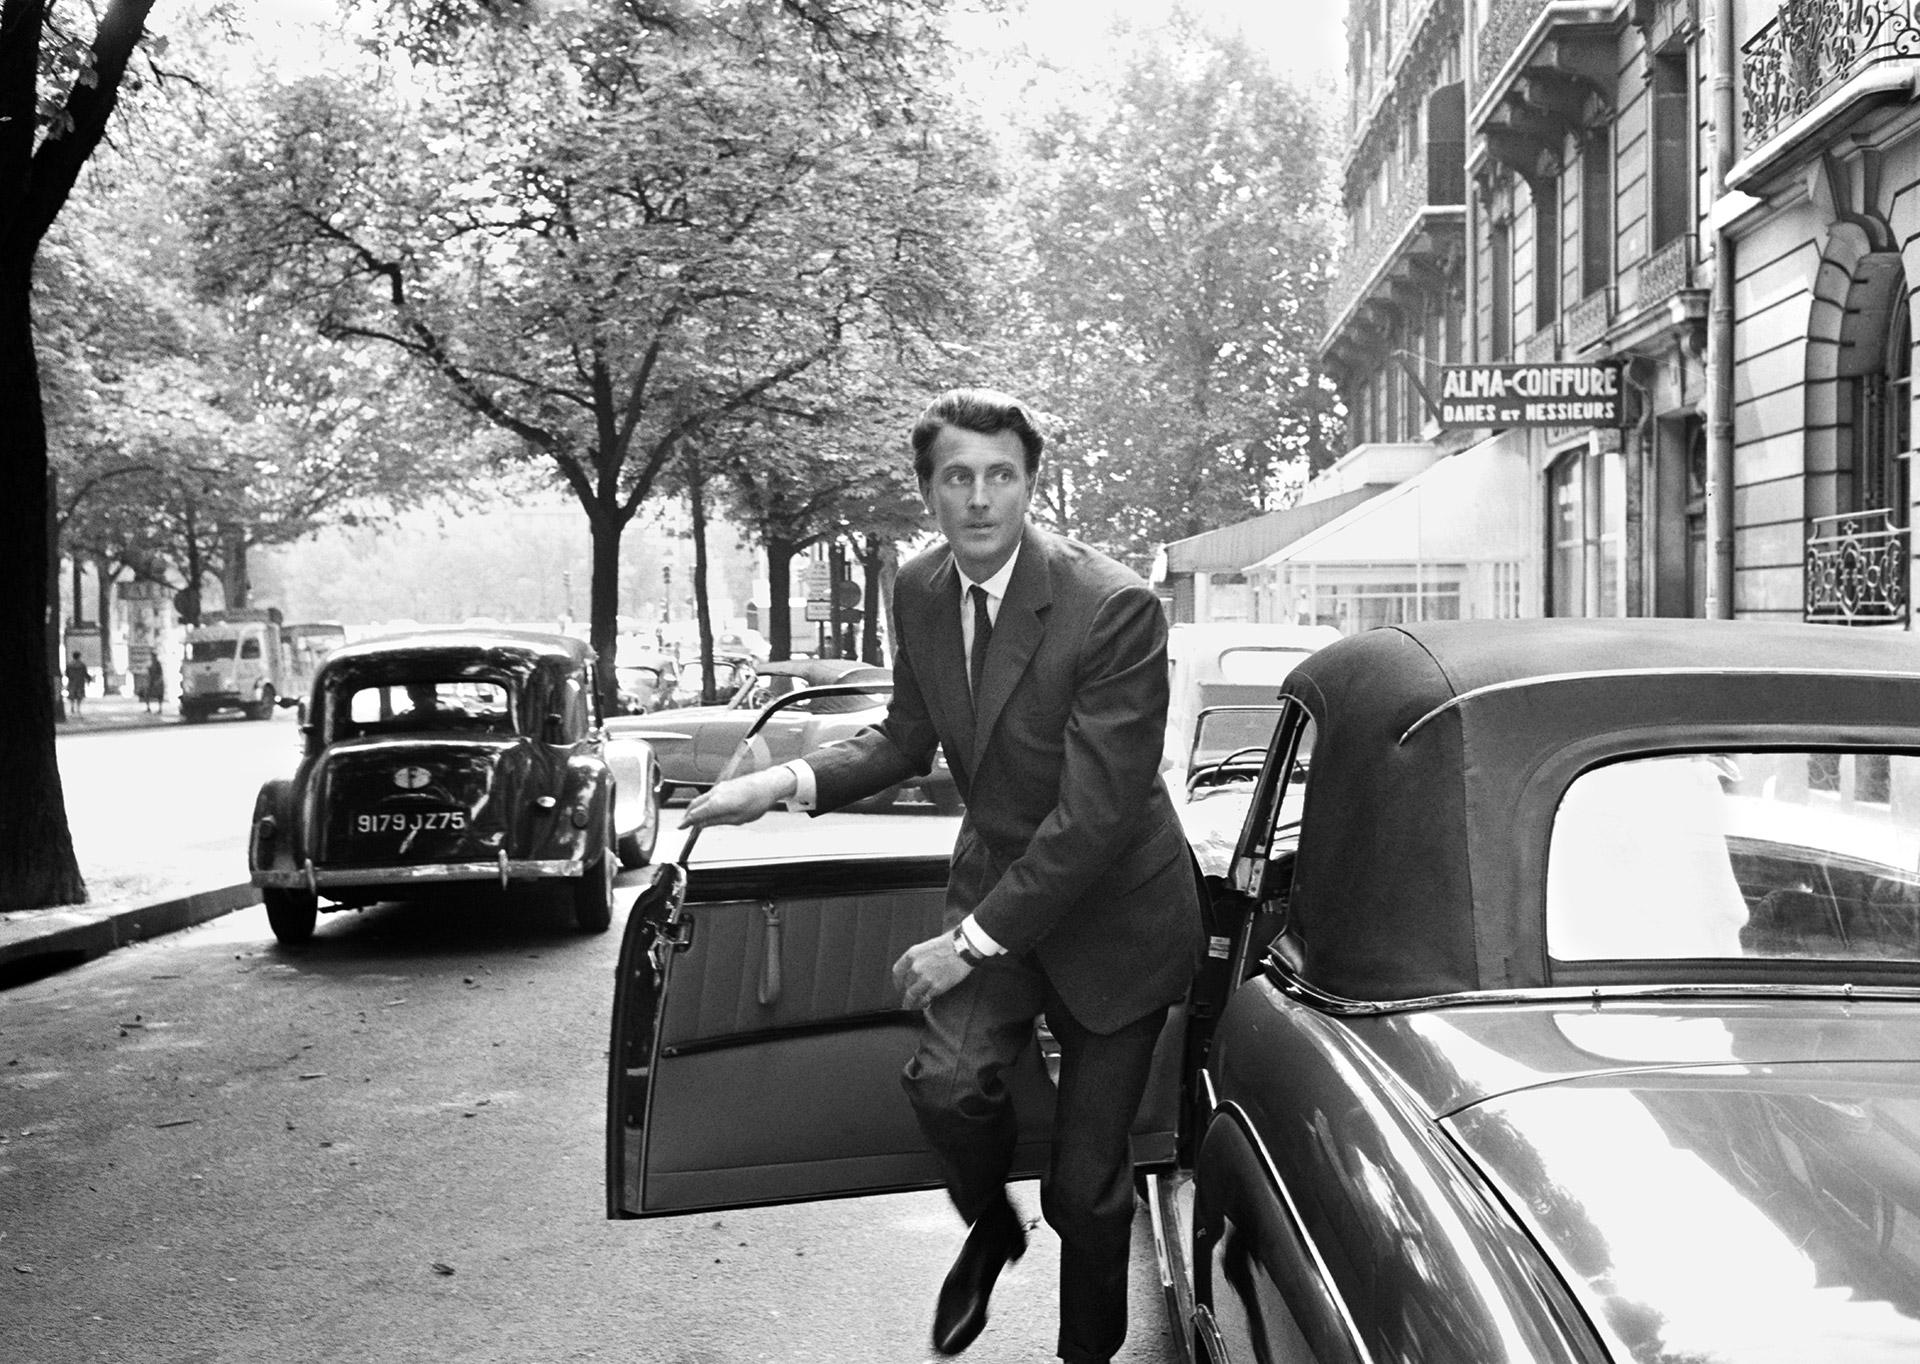 Givenchy. Paris, France, 1961.